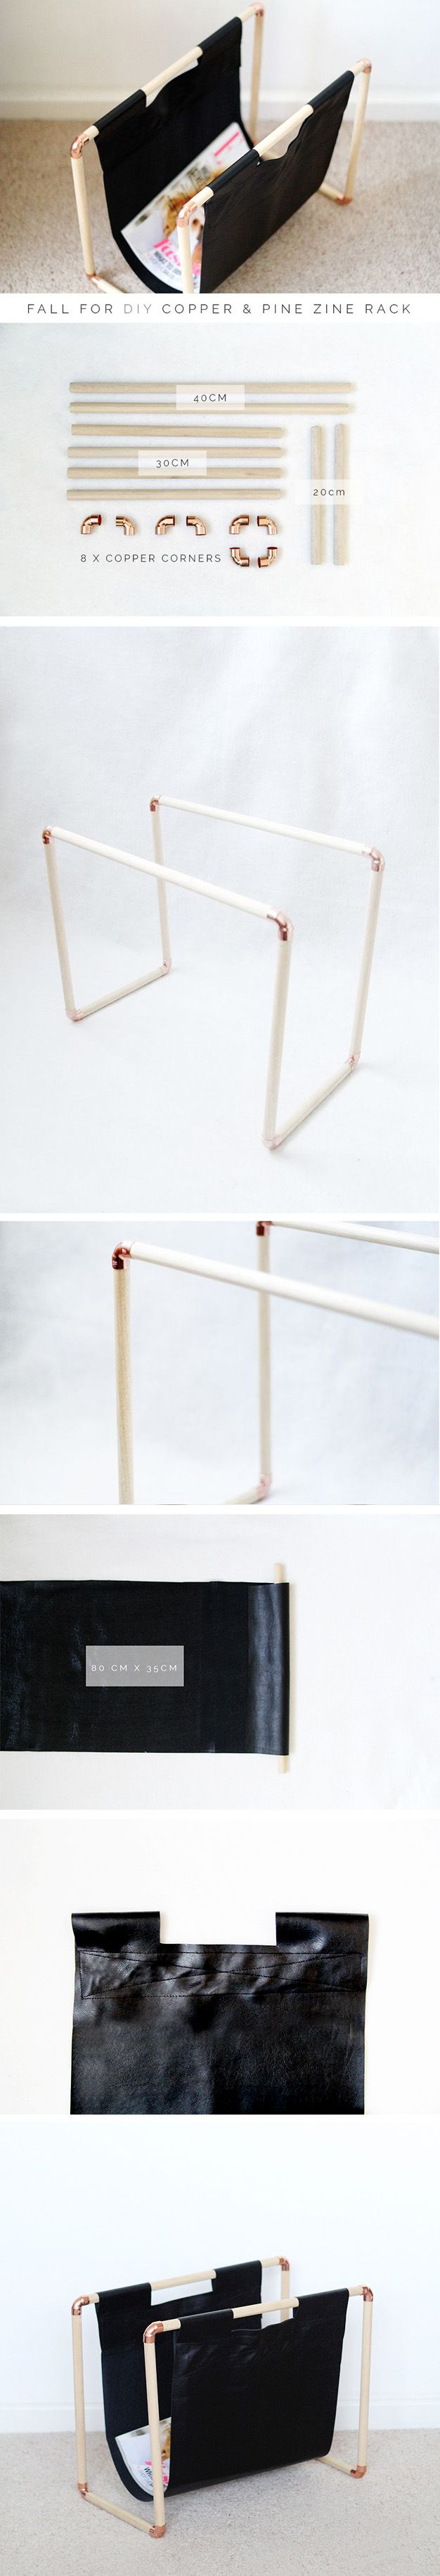 Sencillo revistero DIY / http://www.fallfordiy.com/